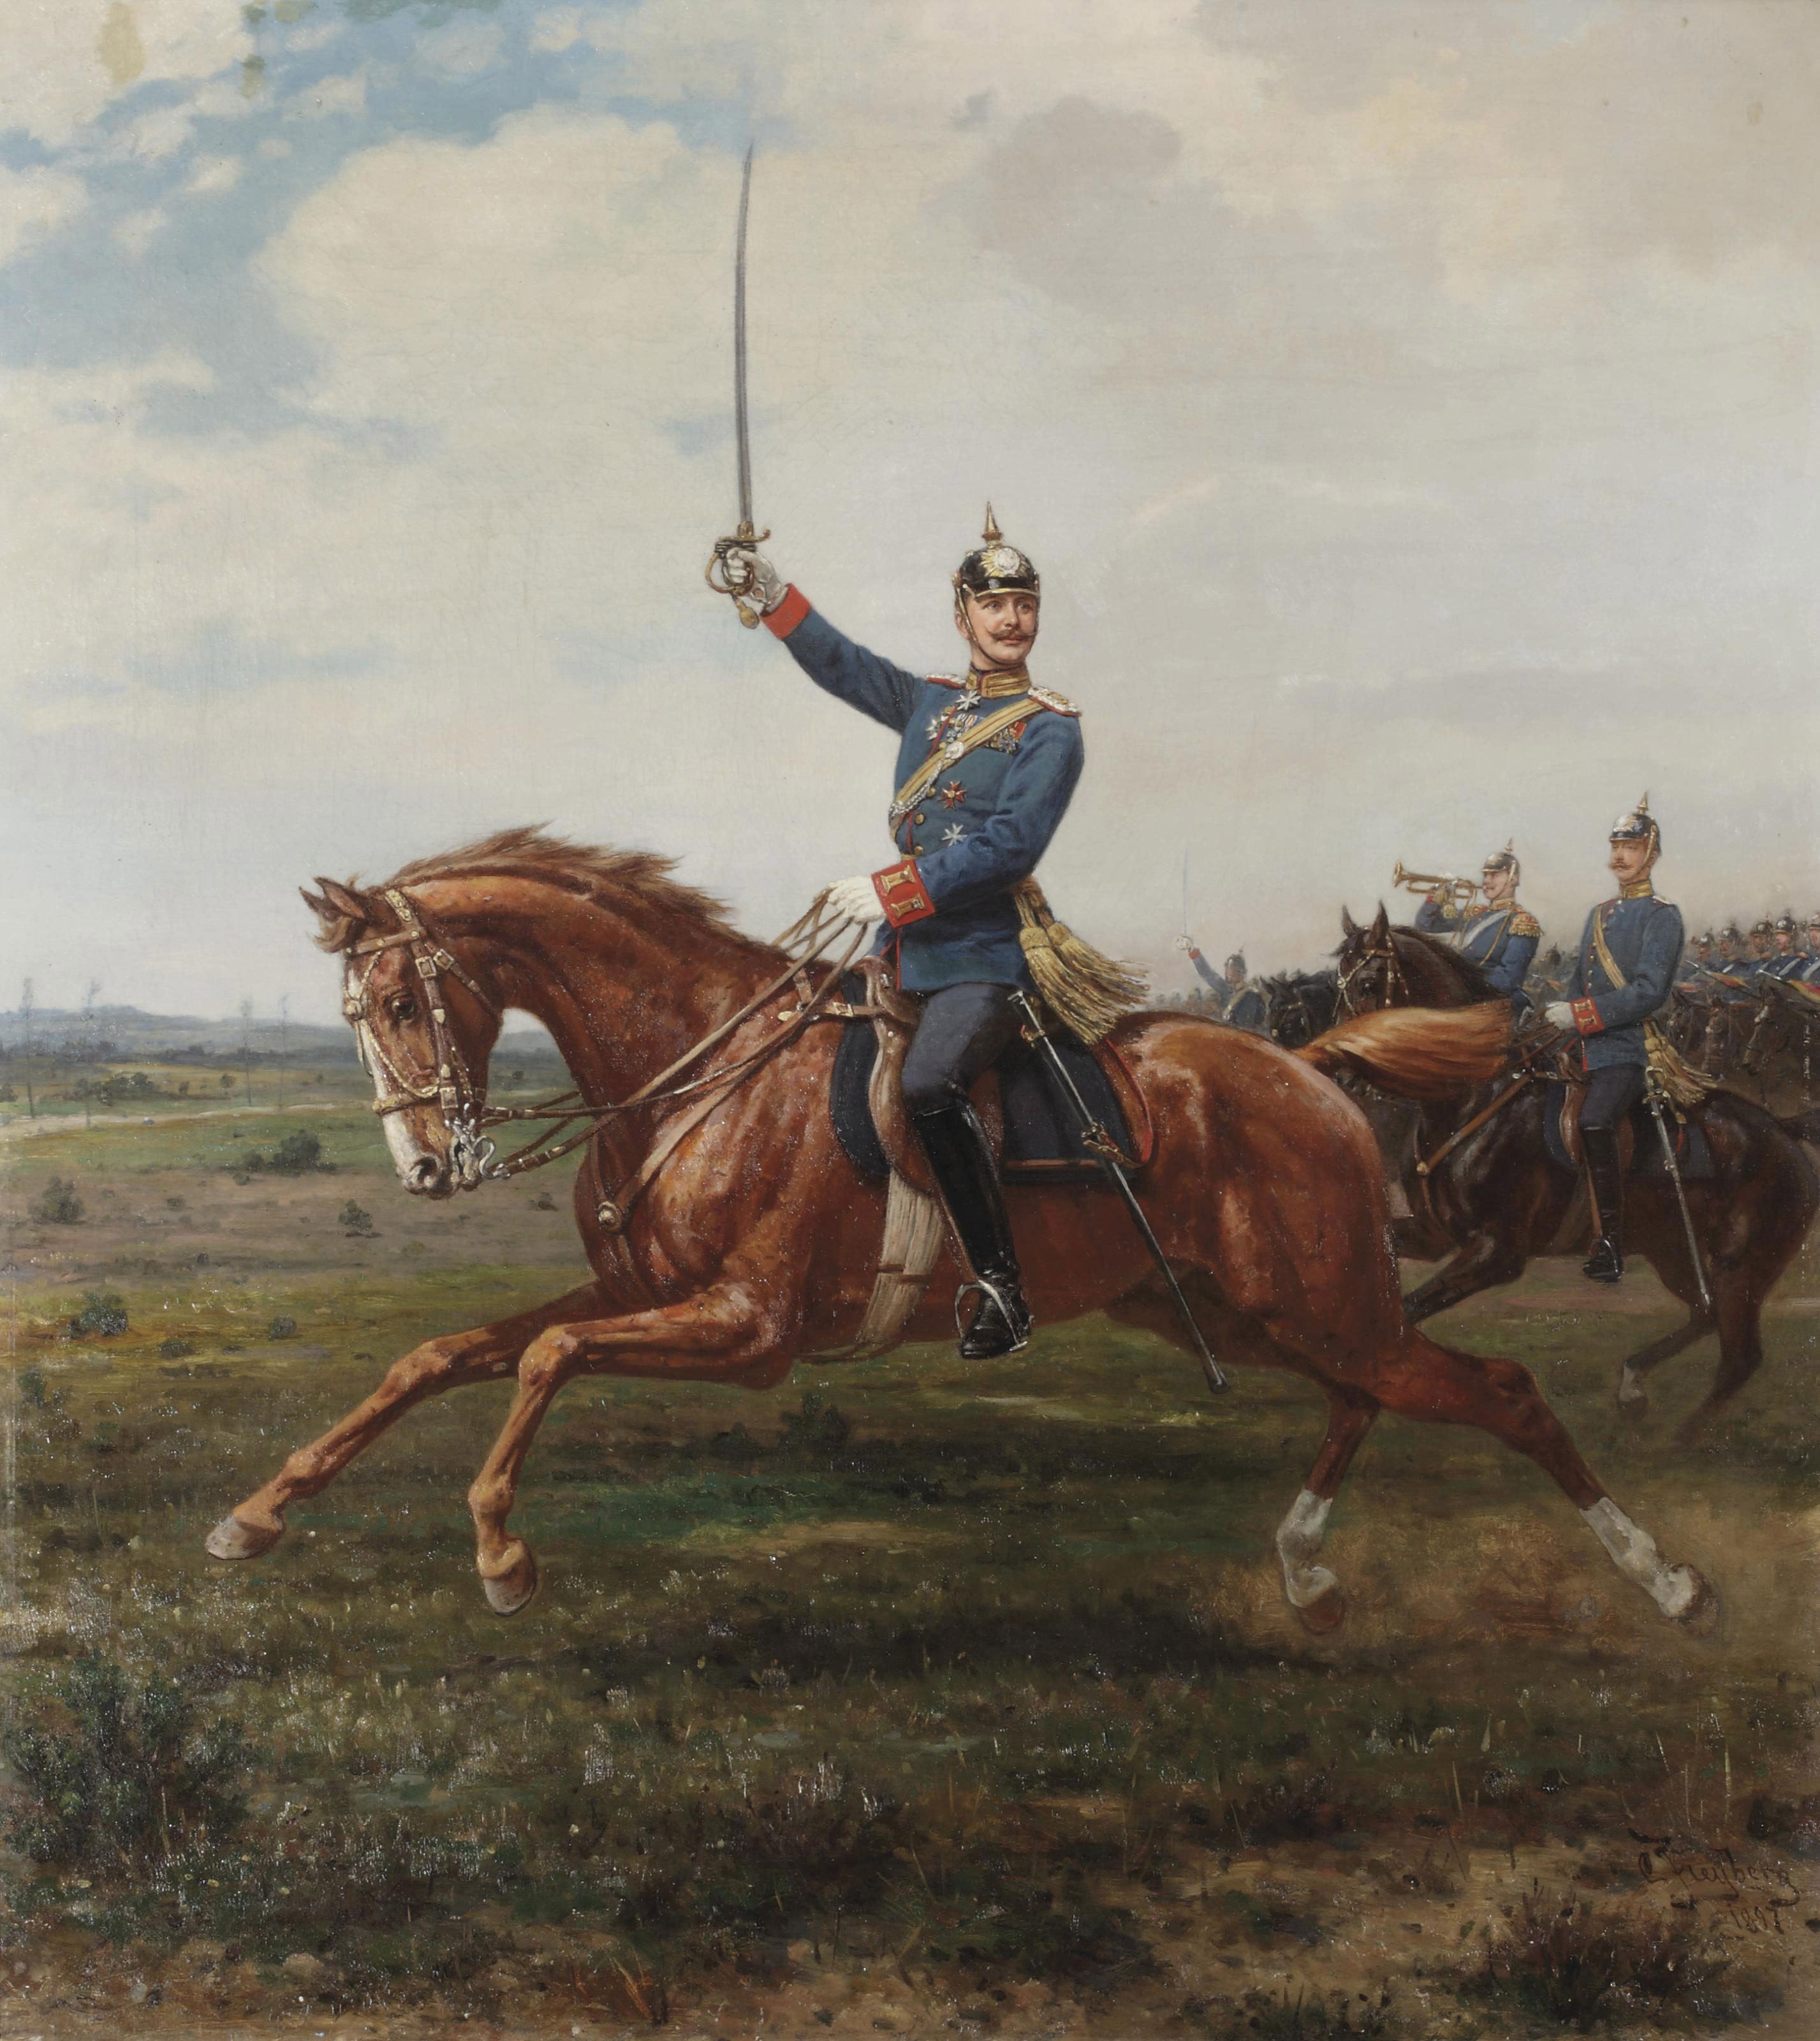 Lieutenant Kunz von Katzler on horseback